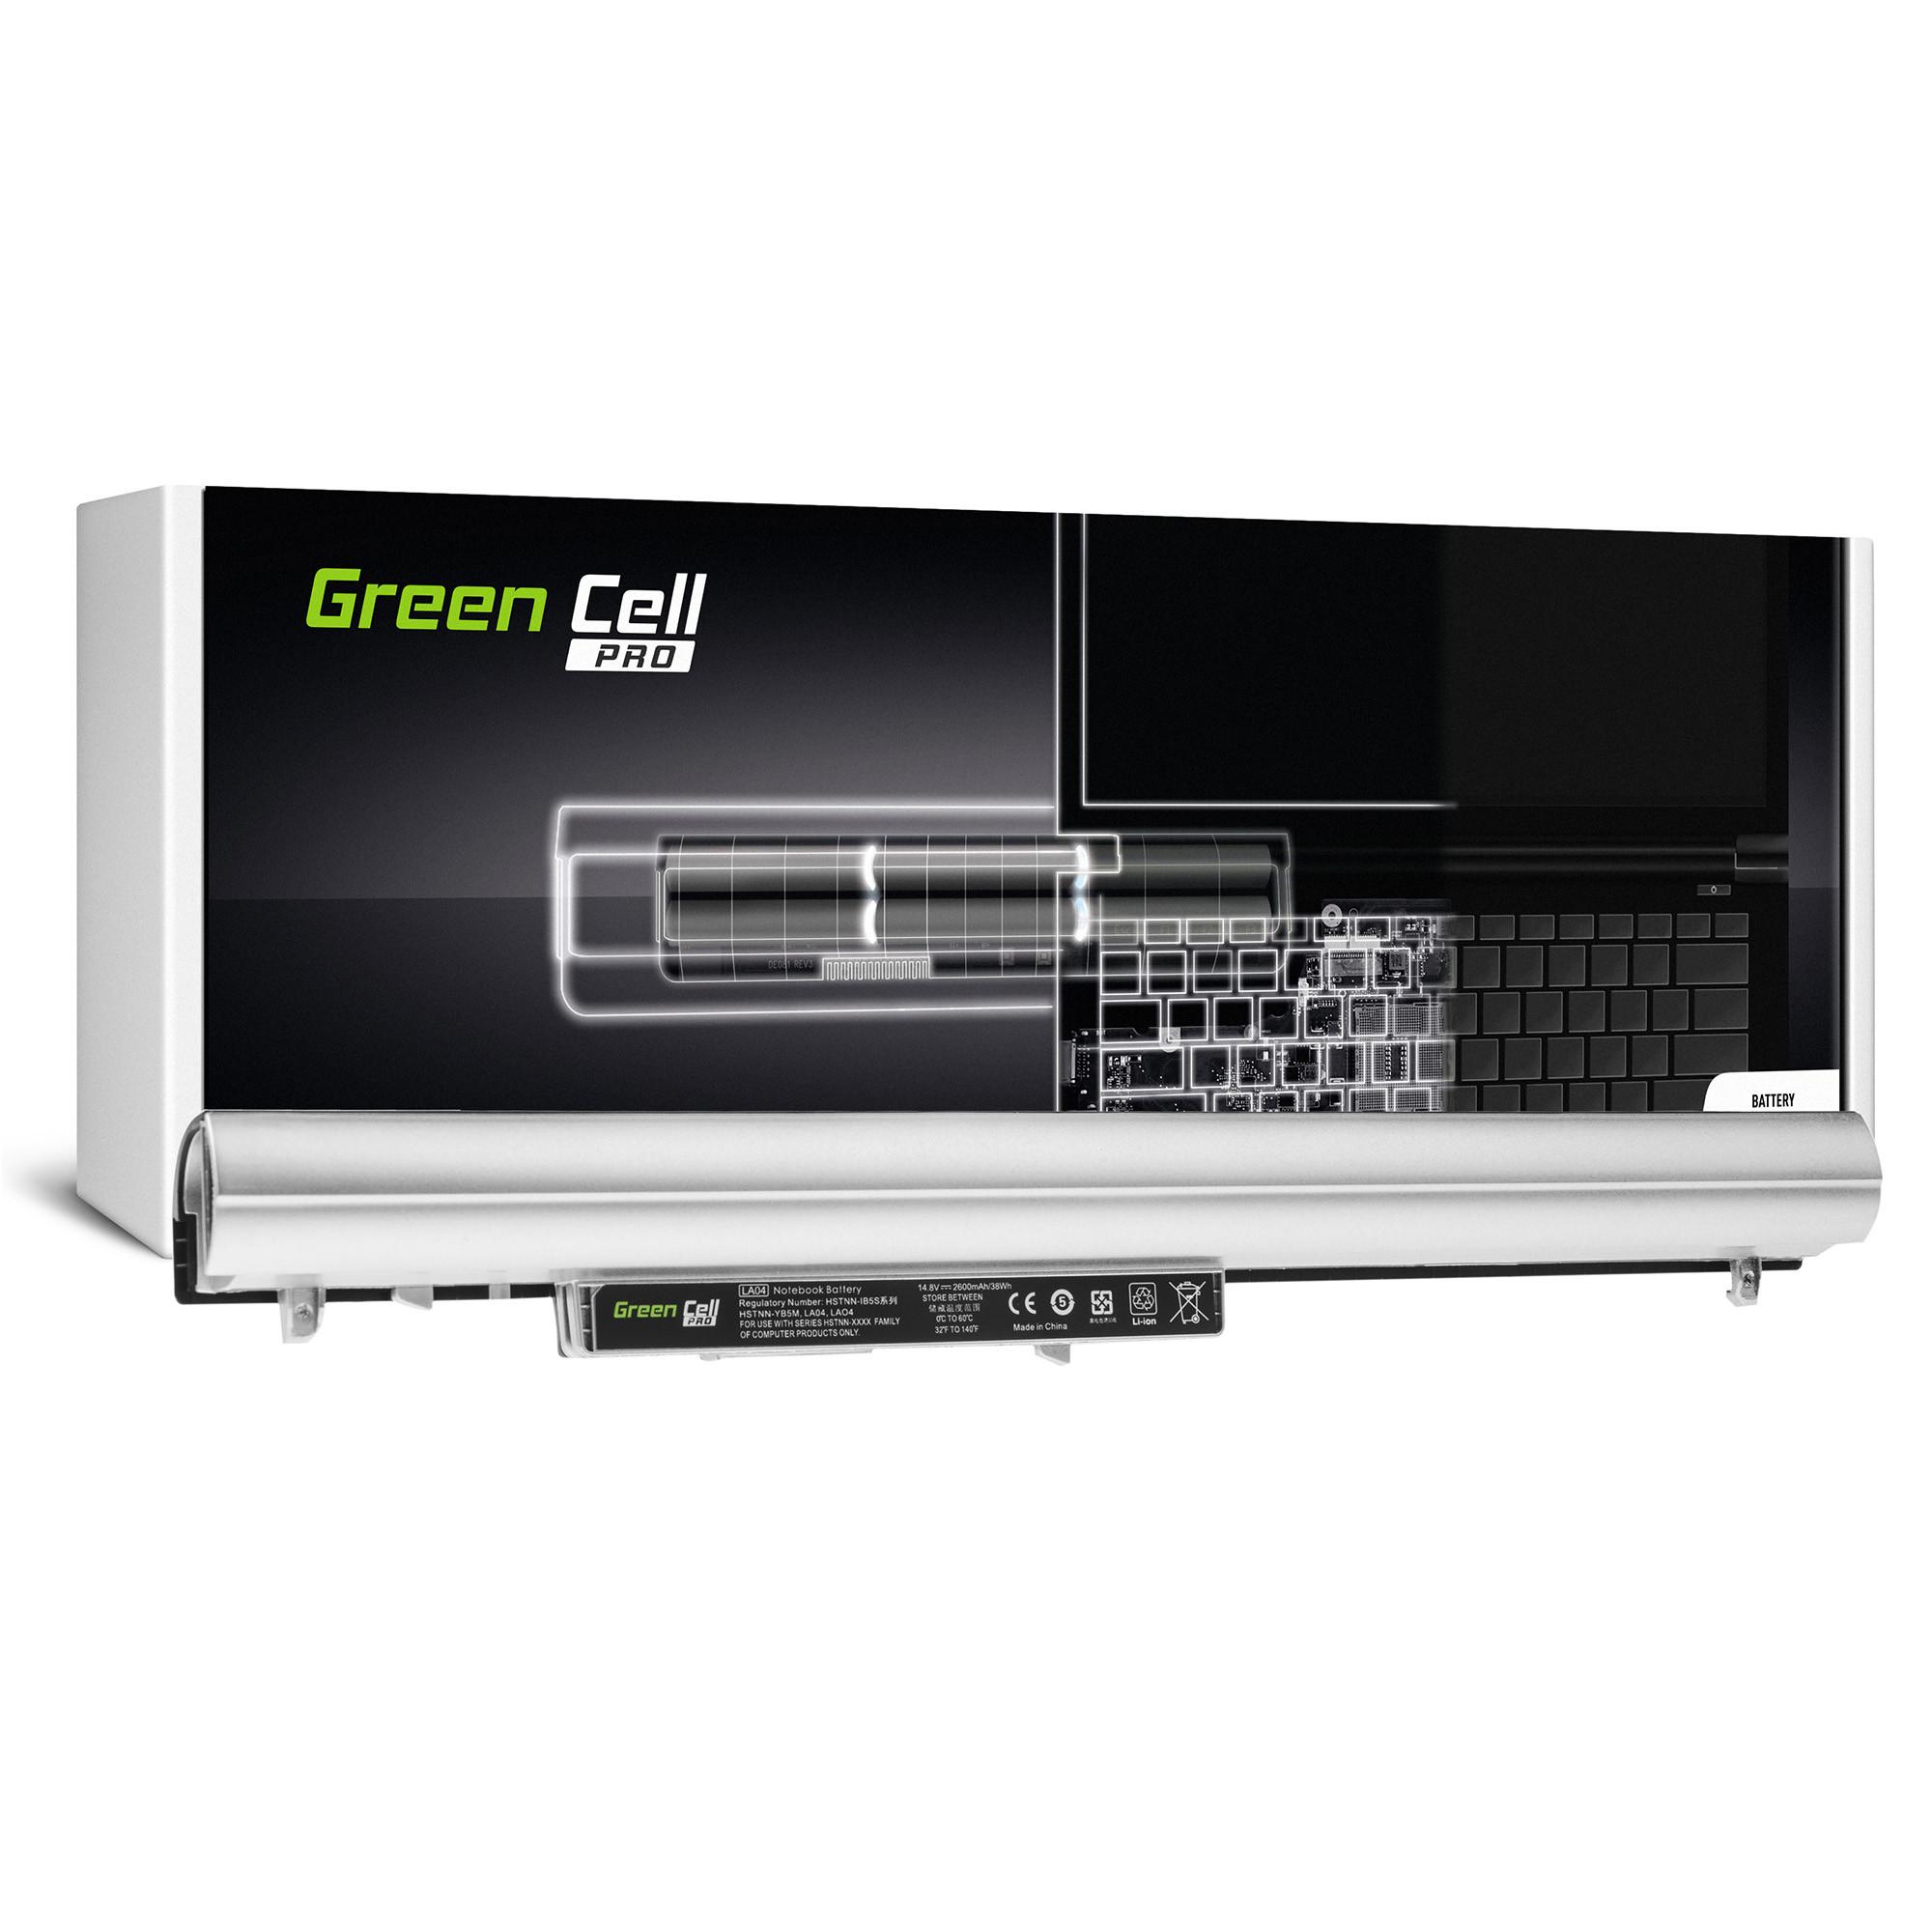 Green Cell HP92PRO Baterie HP LA04 LA04DF, HP Pavilion 15-N 15-N025SW 15-N065SW 15-N070SW 15-N080SW 15-N225SW 15-N230SW 15-N280SW 2600mAh Li-Ion - neoriginální